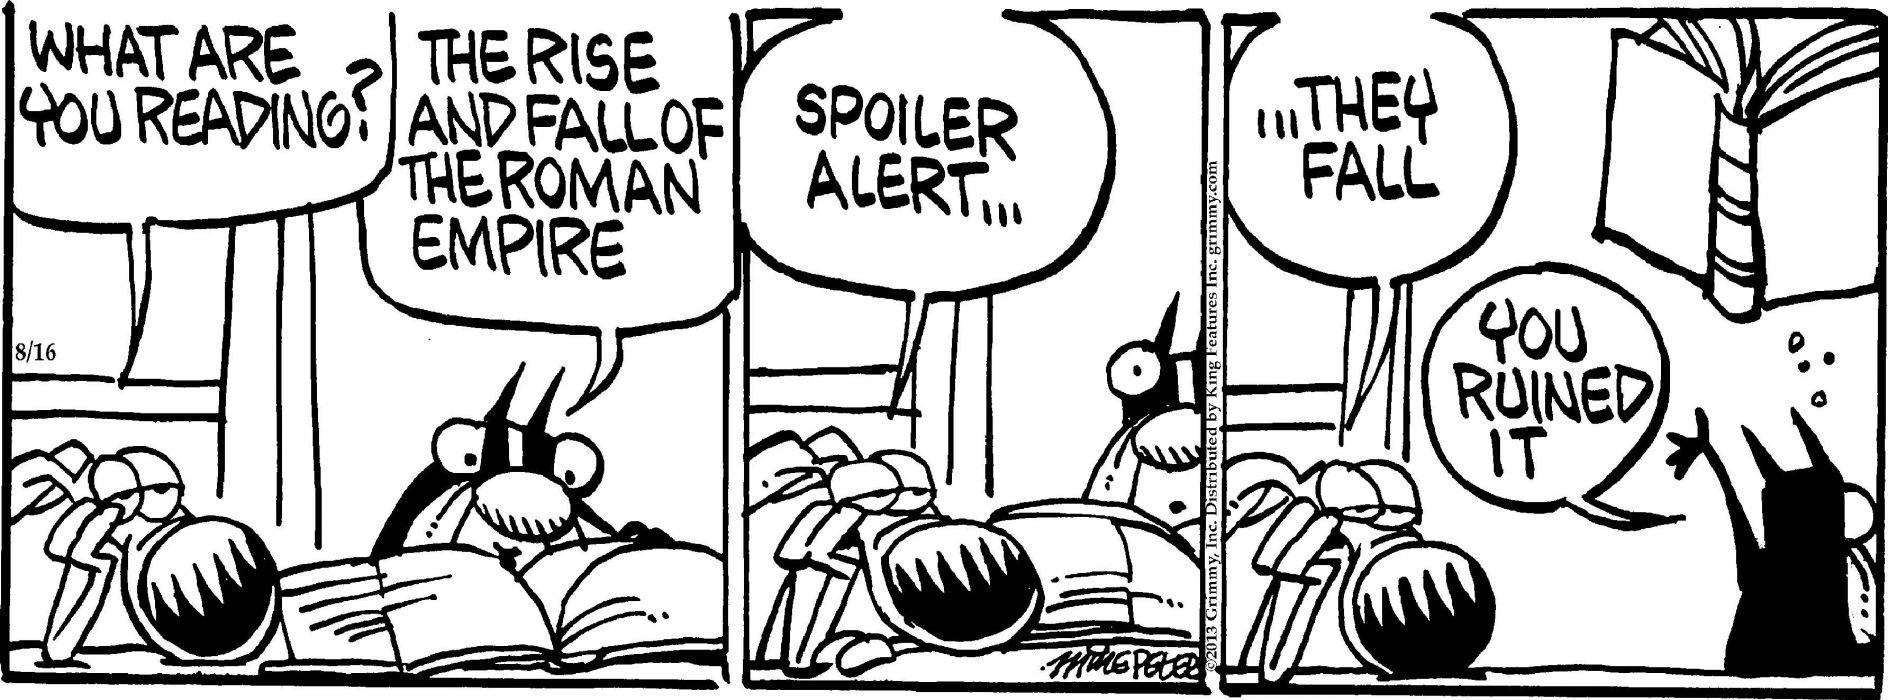 MOTHER-GOOSE-AND-GRIM mother goose grim funny humor comicstrip (14) wallpaper